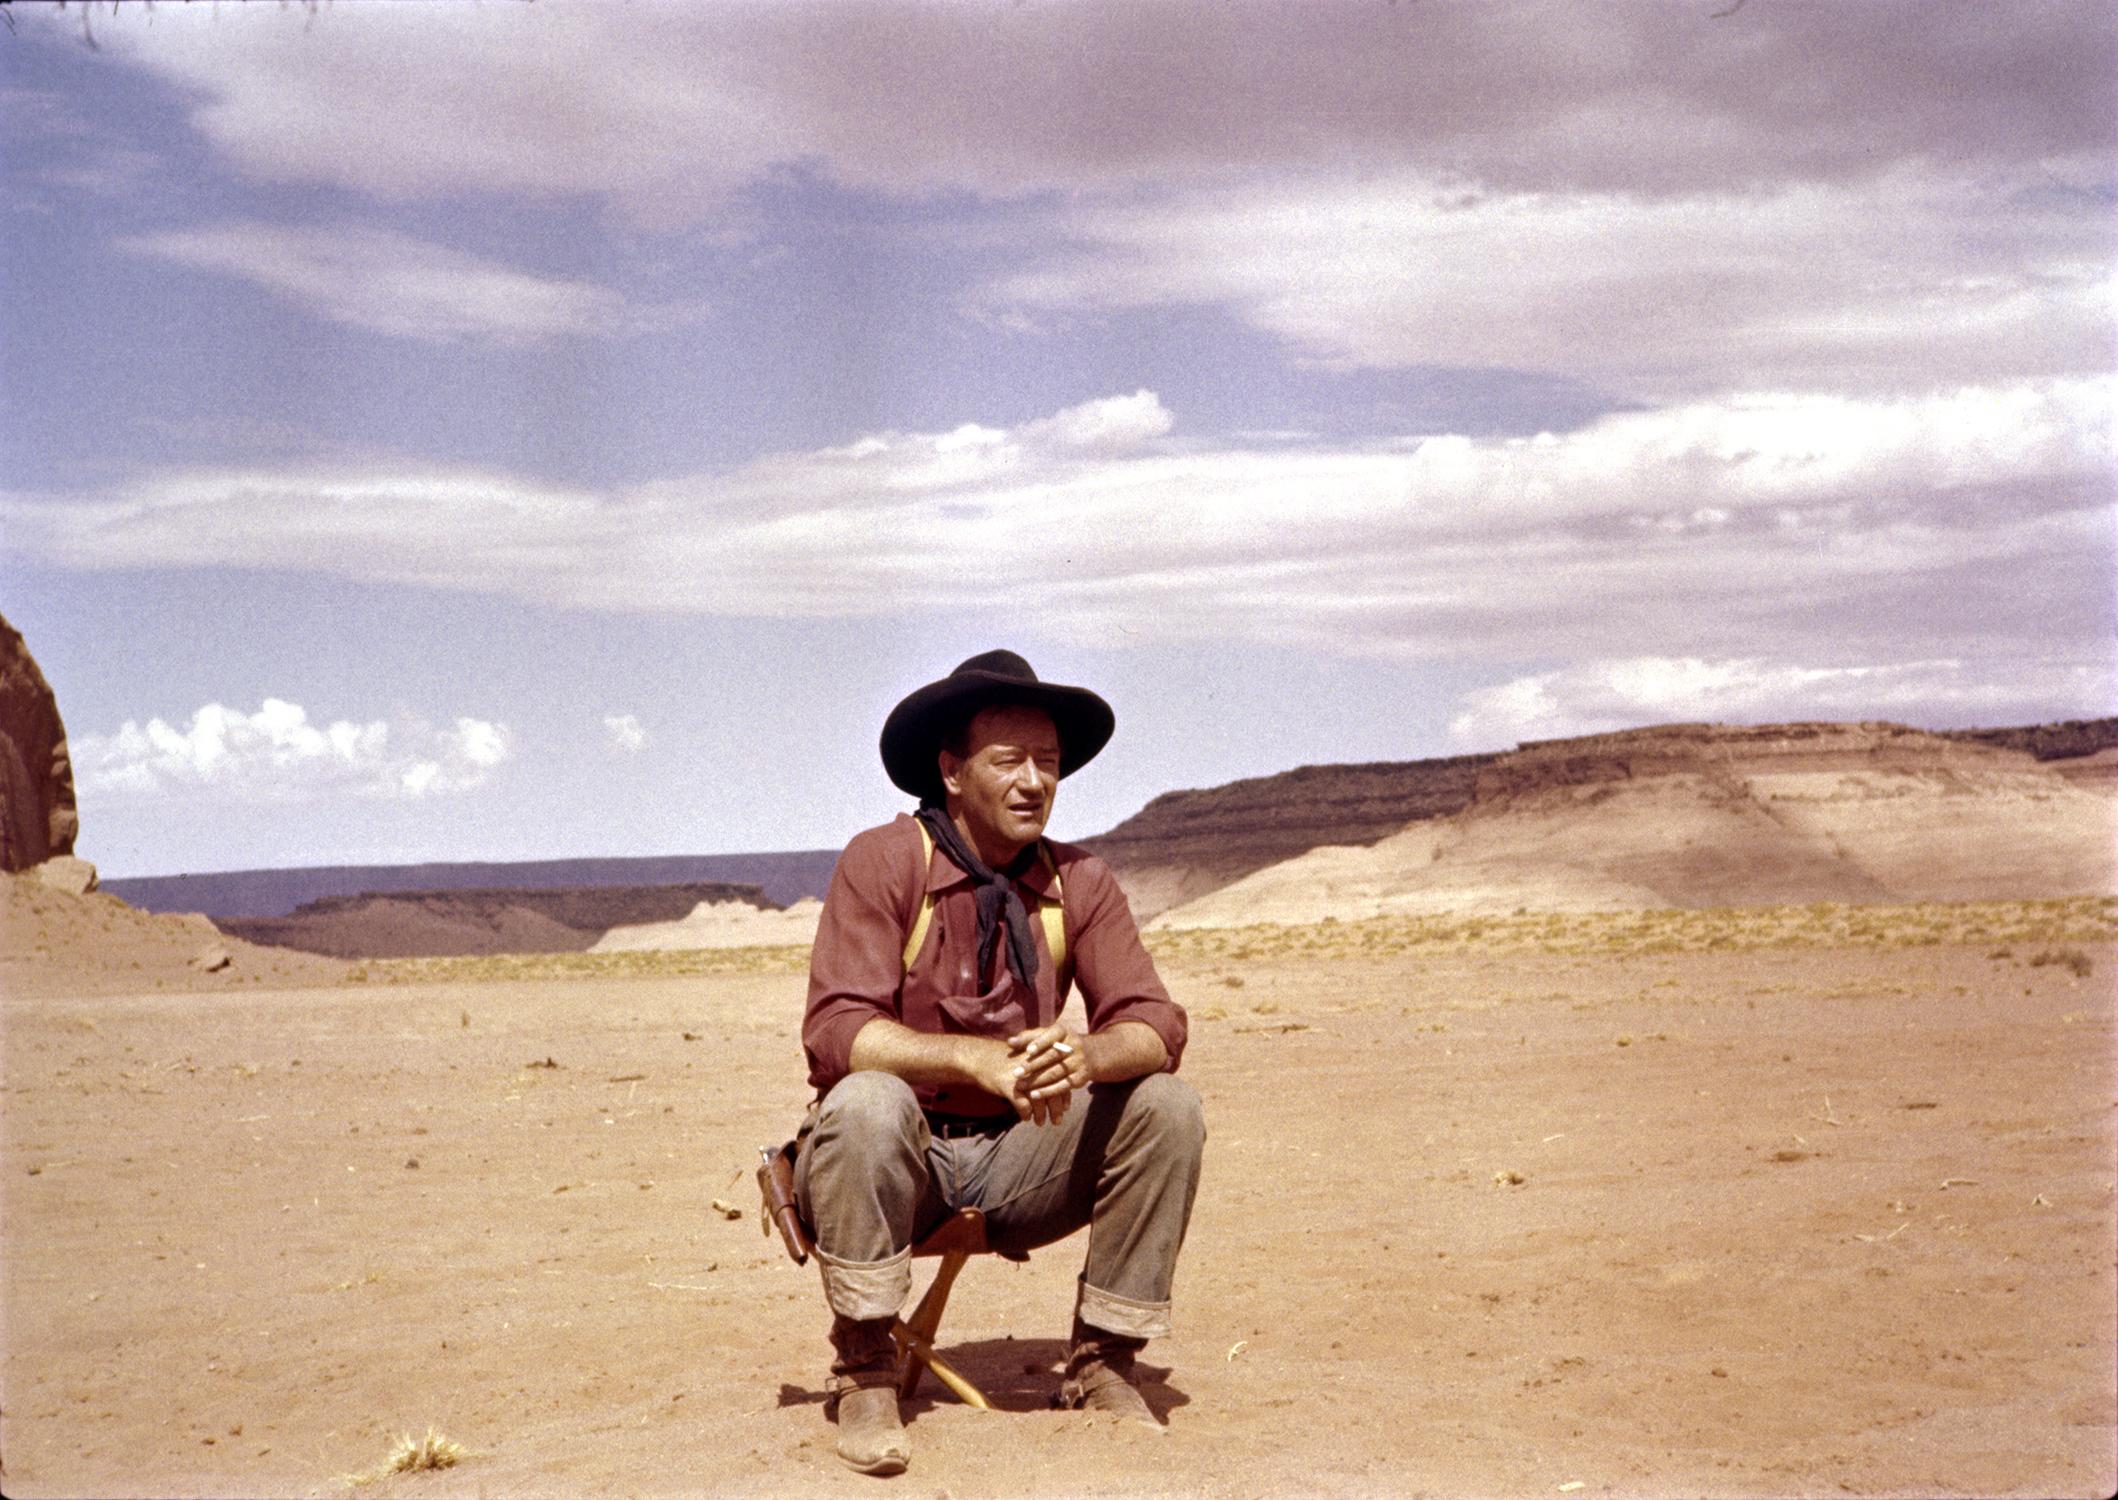 Duke looking effortlessly cool in The Searchers (1956). © John Wayne Enterprises / John R. Hamilton Collection